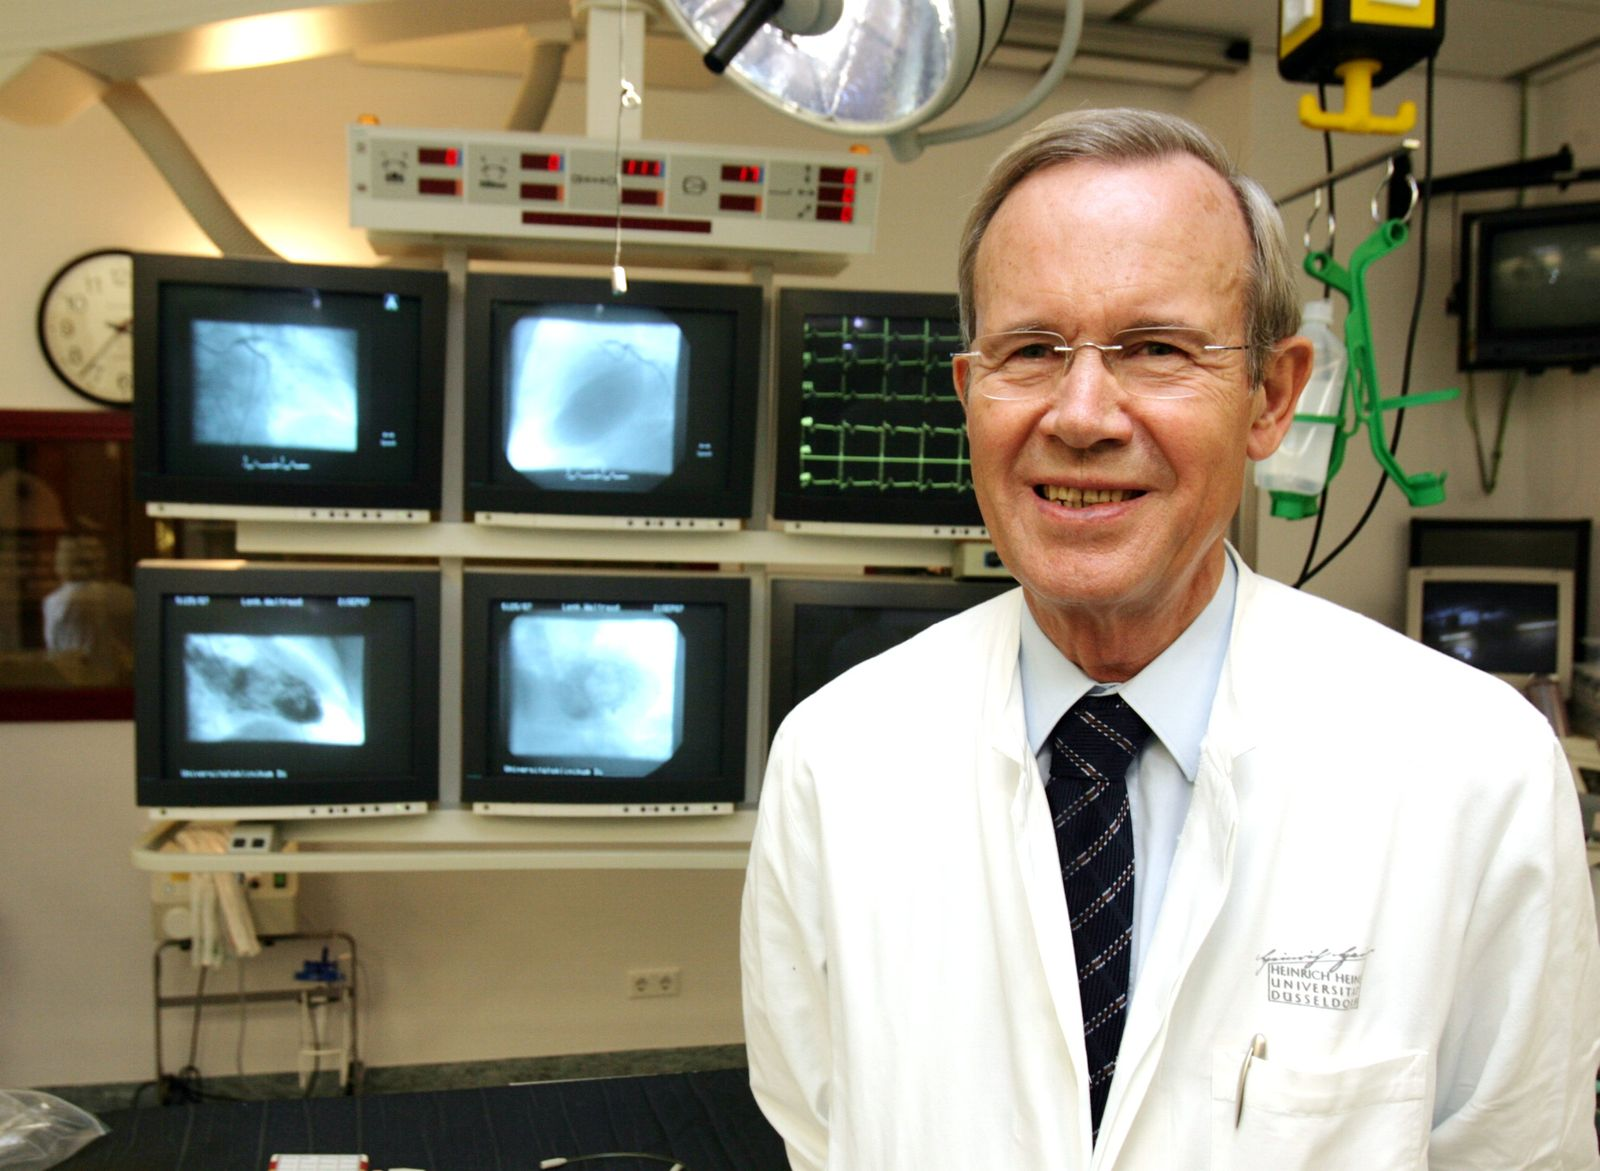 Stammzellen-Therapie / Herzschock-Patienten / Strauer